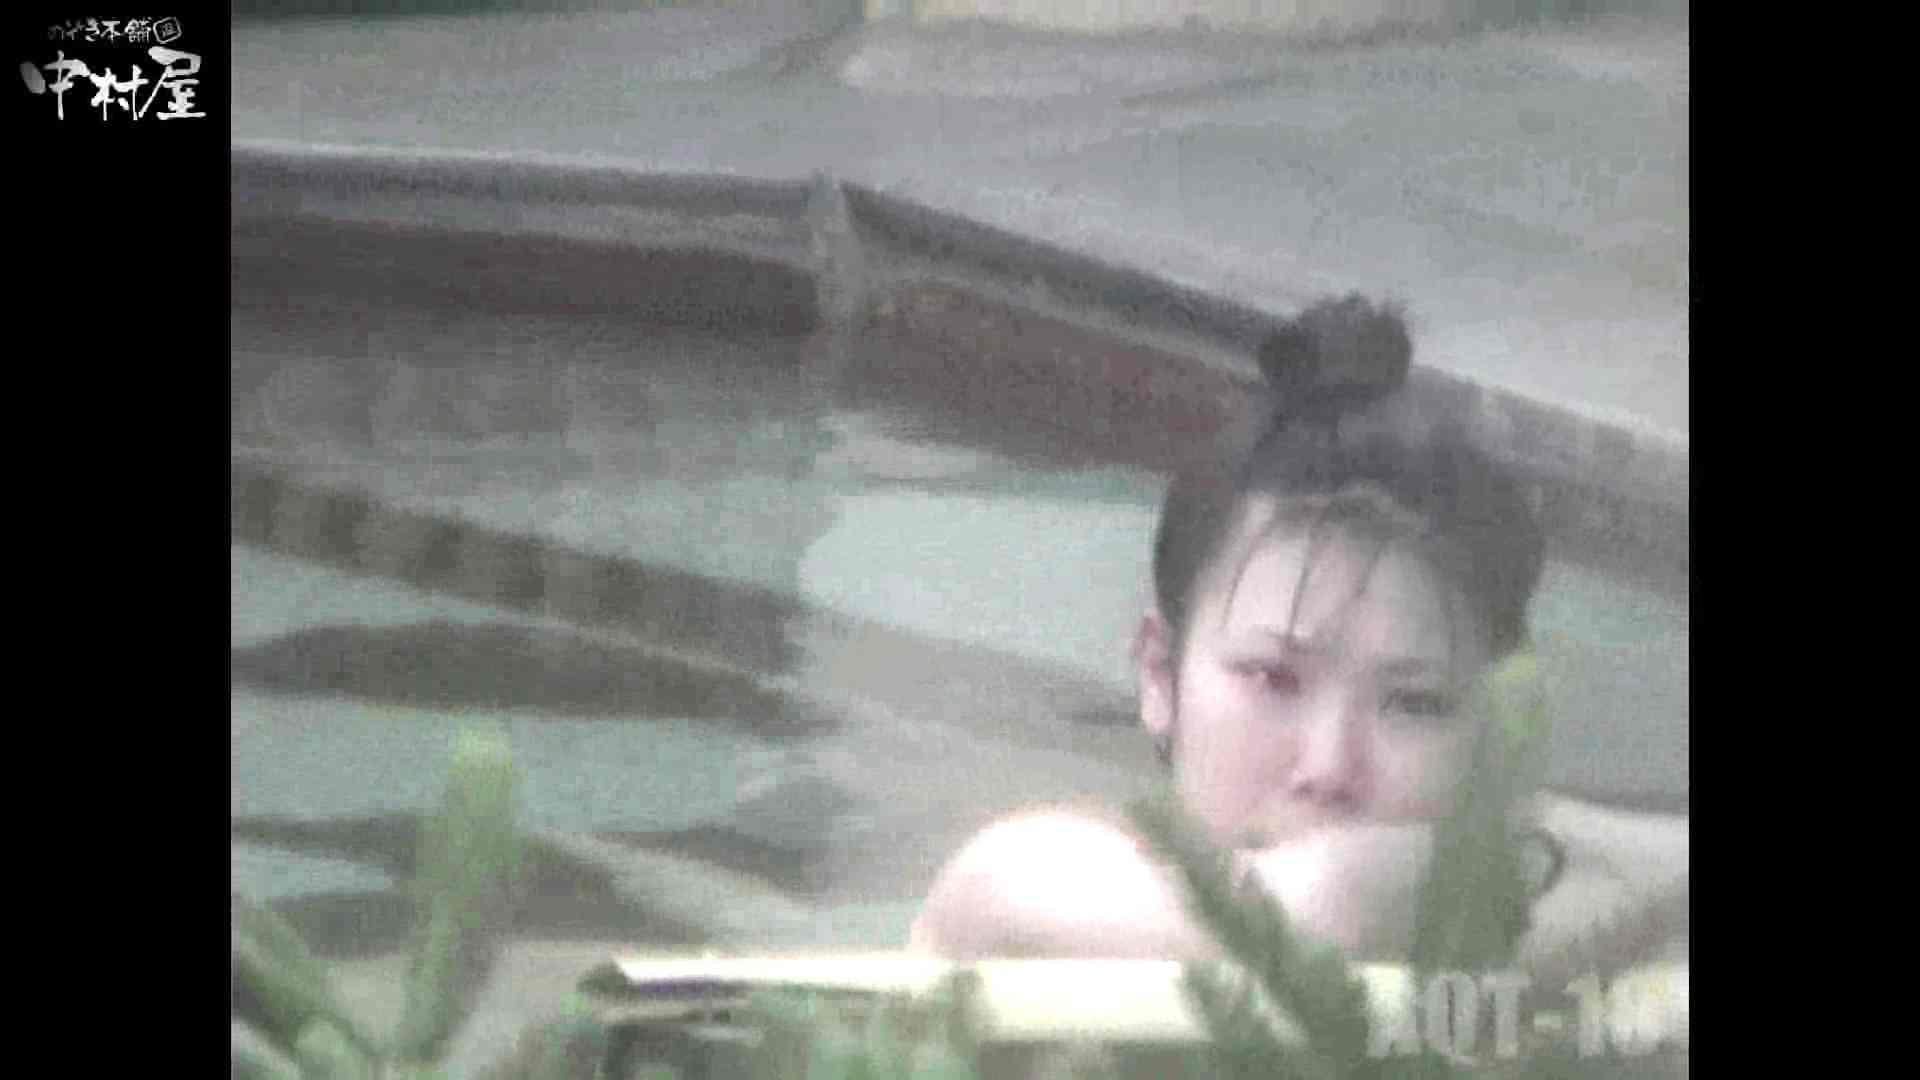 Aquaな露天風呂Vol.882潜入盗撮露天風呂十八判湯 其の二 潜入 おめこ無修正動画無料 90画像 83